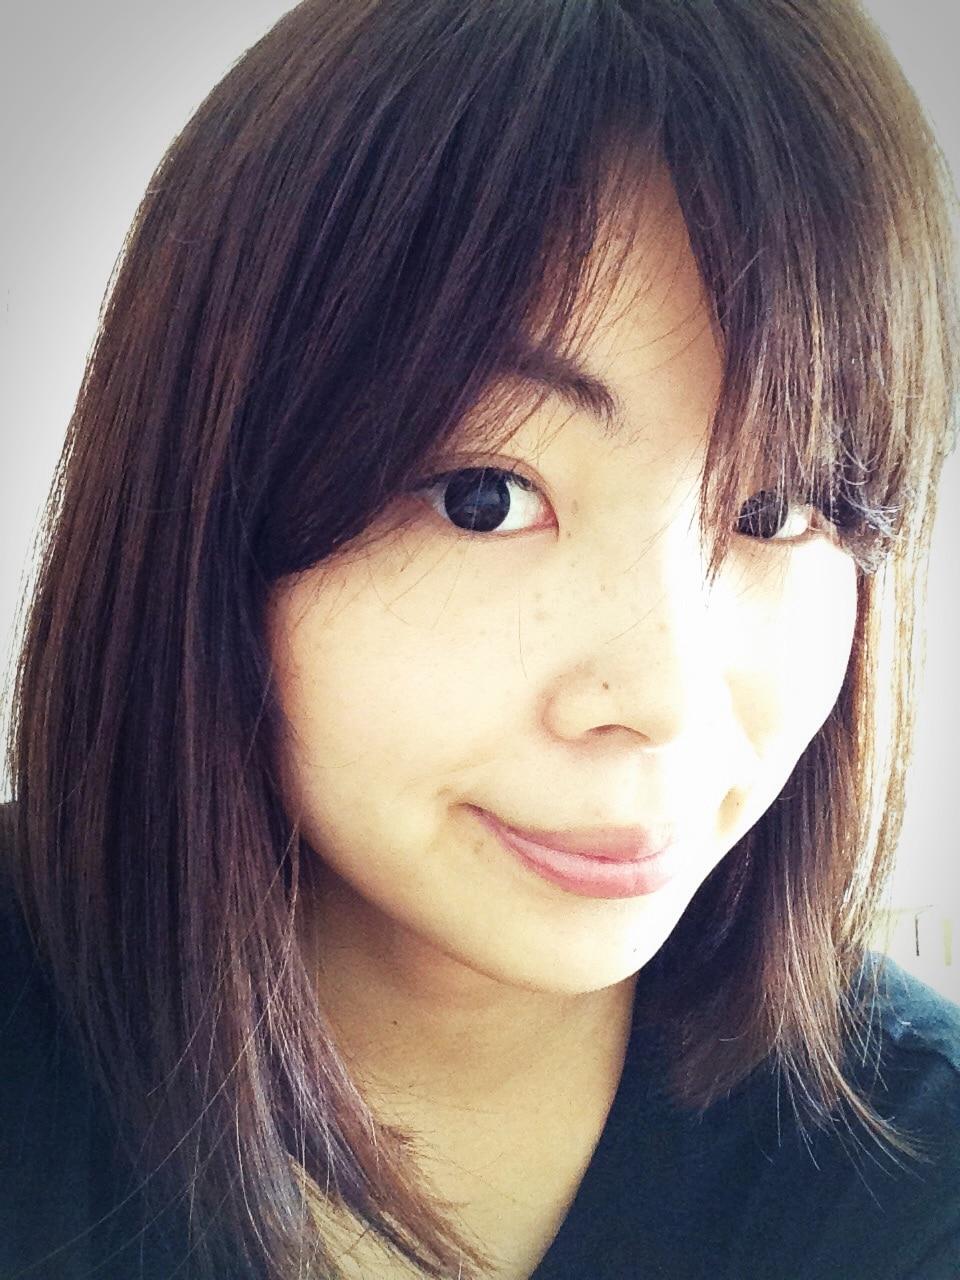 Tomoko from Kamakura